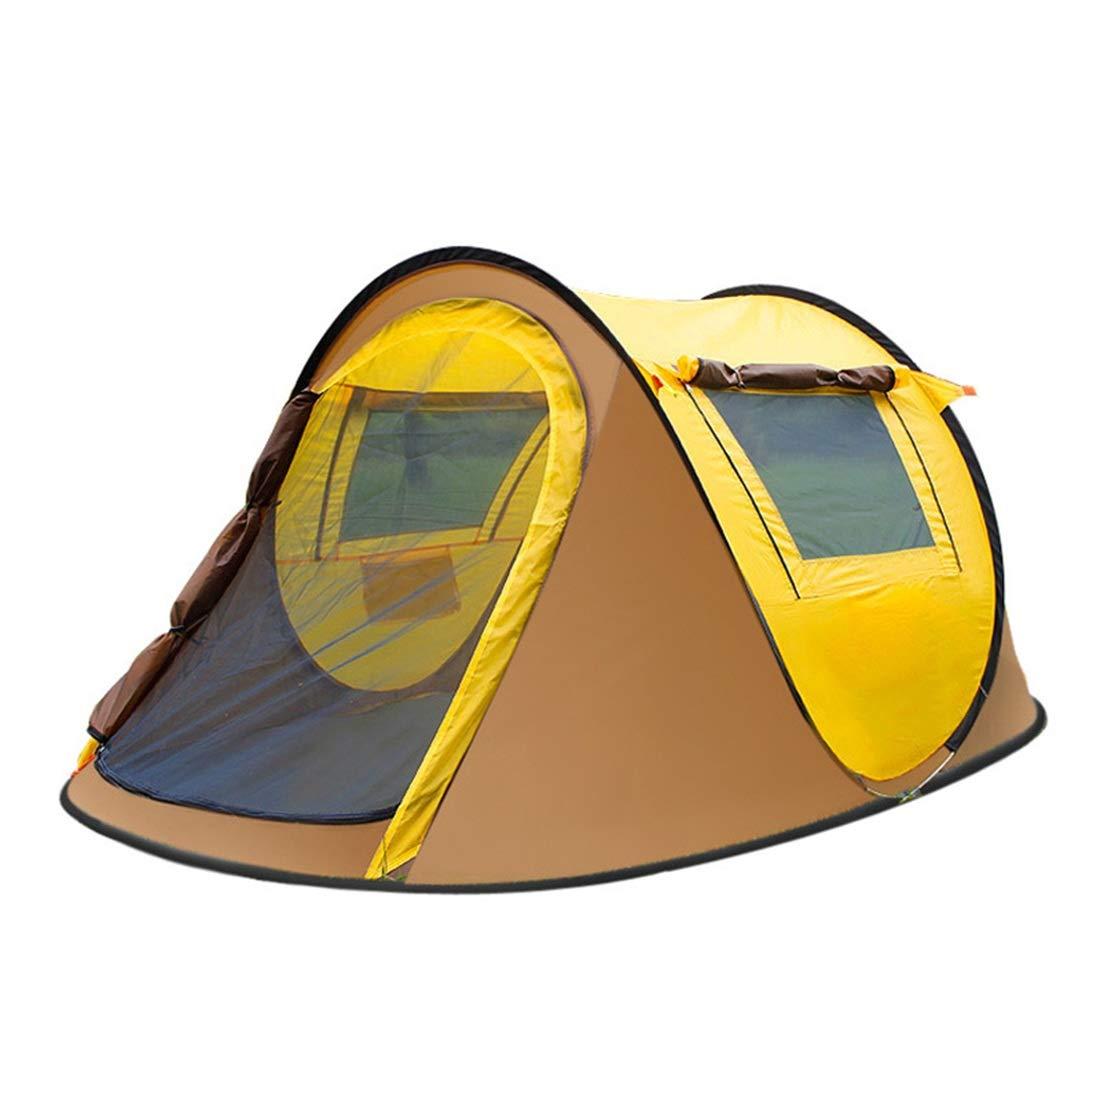 Xasclnis Bergsteigerzelt 3-4 Personen Automatik Feld Camping Doppelzelt Winddicht Sonnenschutzzelt Geeignet für Outdoor-Athleten (Farbe : Gelb)